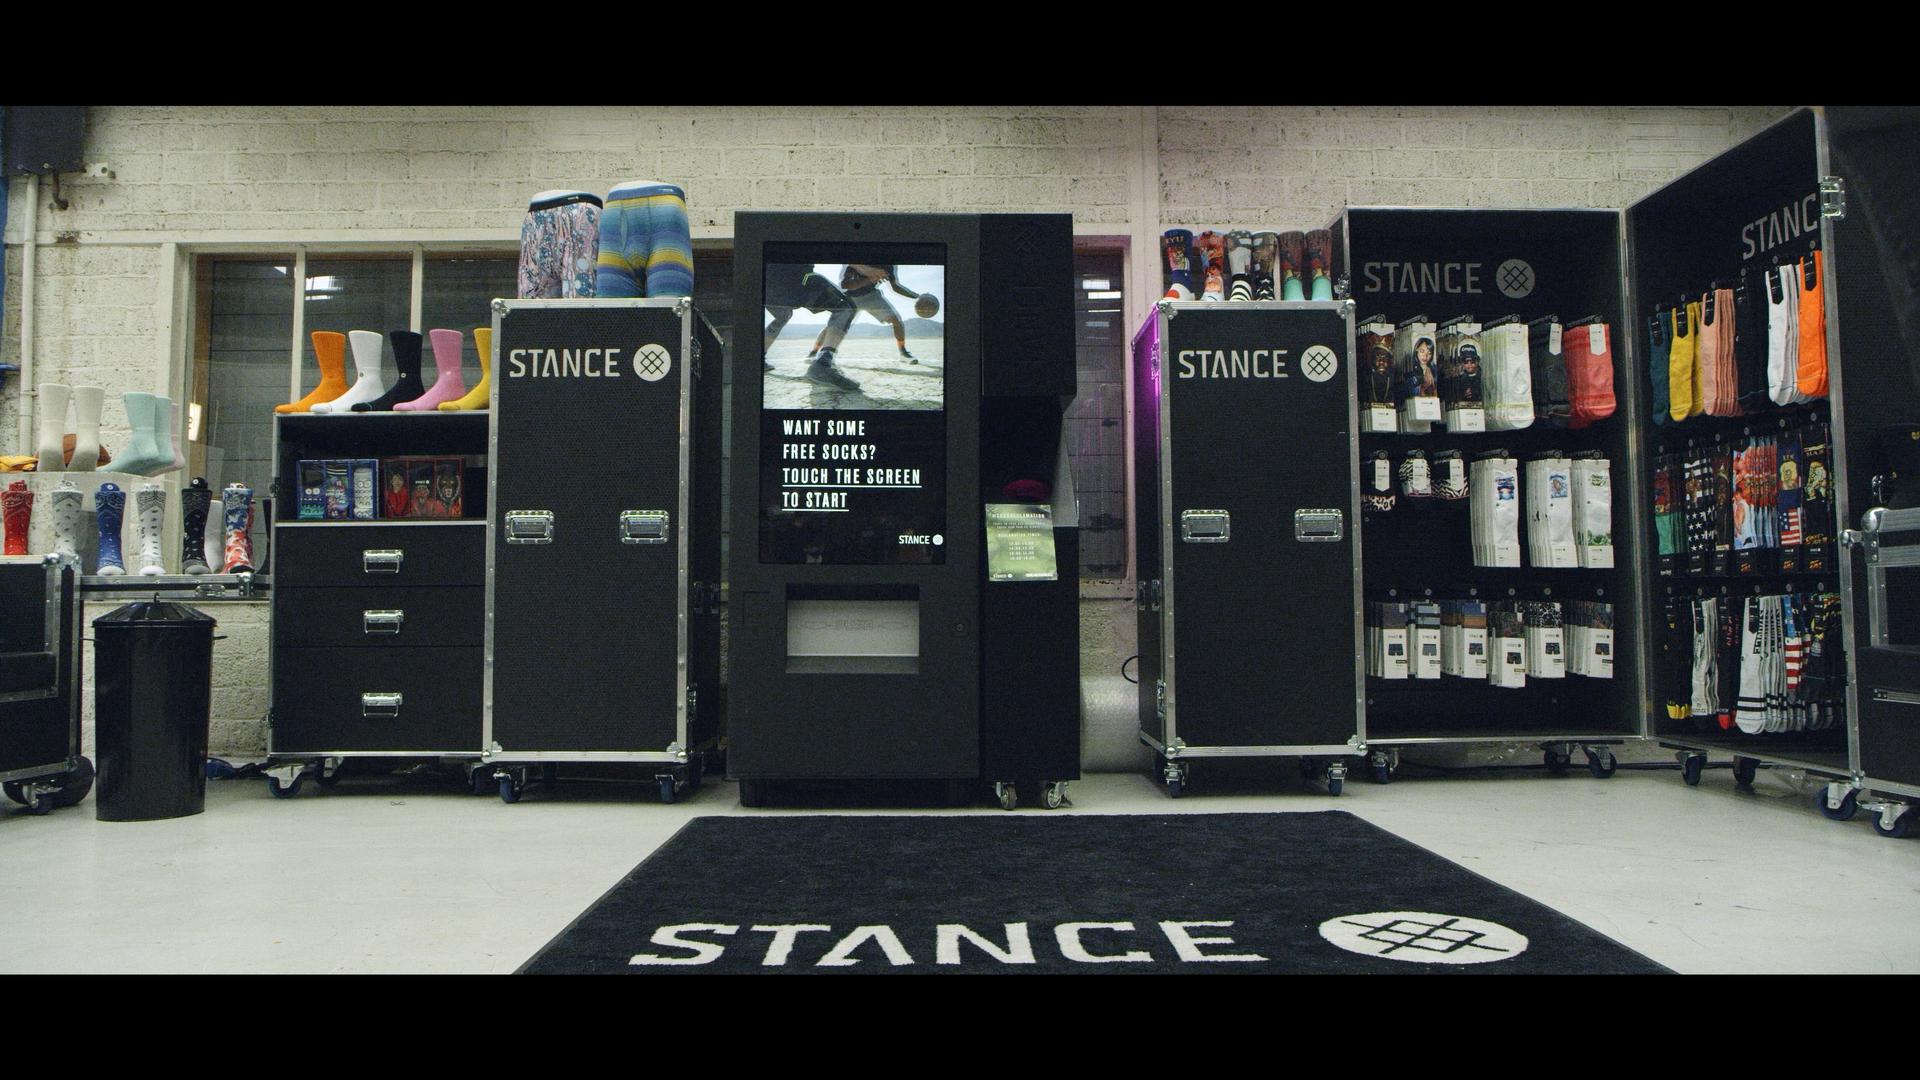 Stance-AMSTD-_1.1.13.jpg